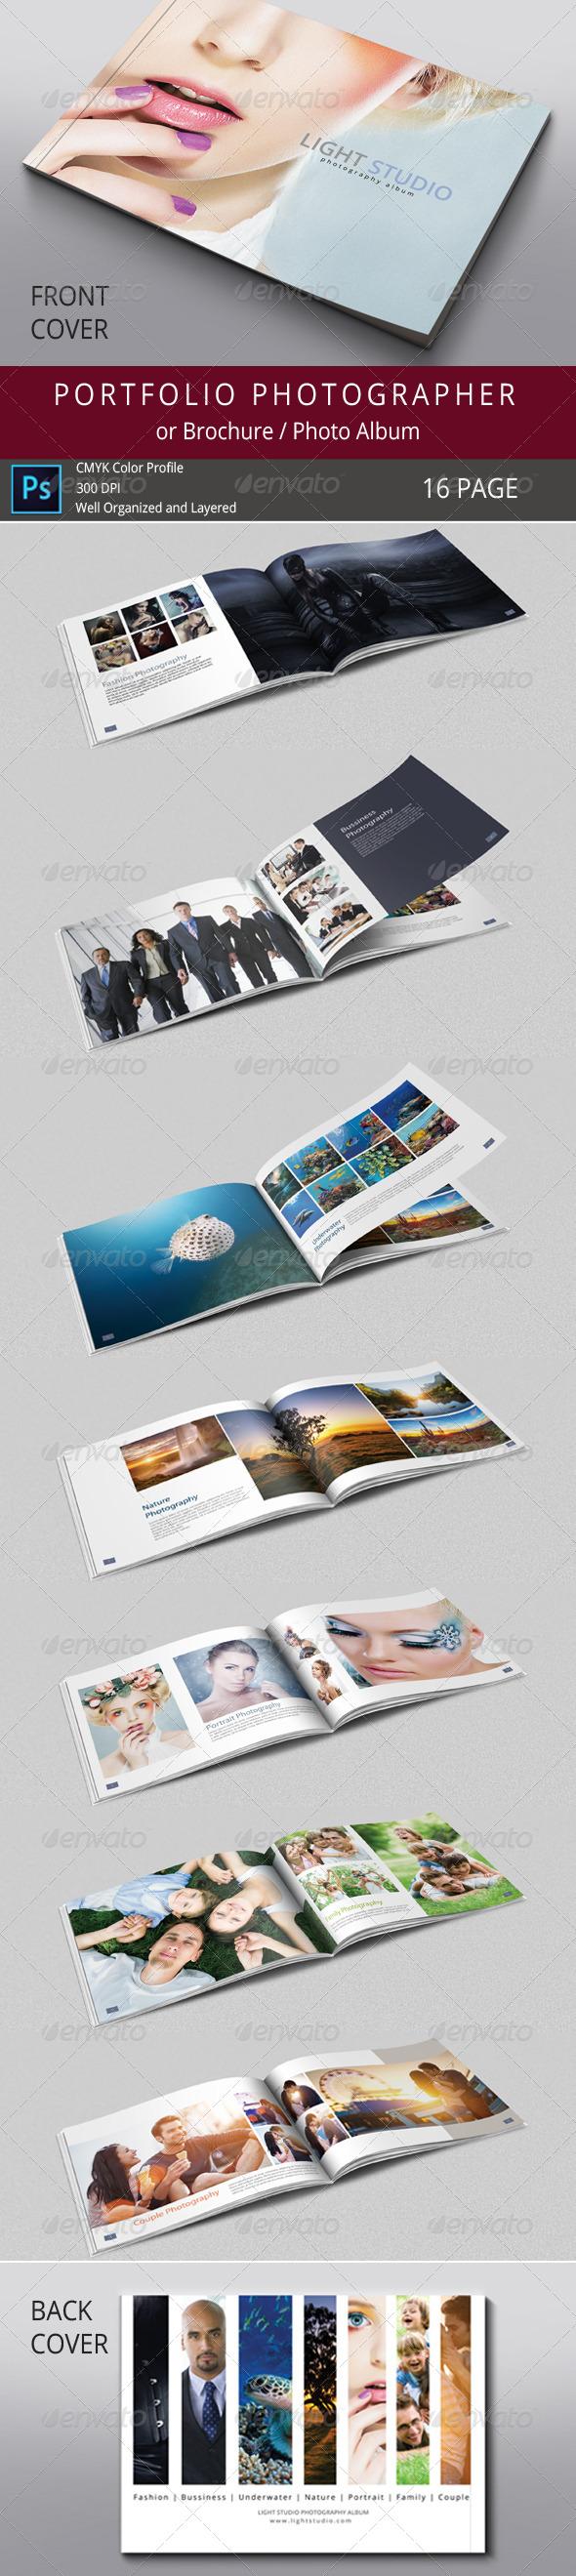 Photography and Portfolio Photo Album Templates